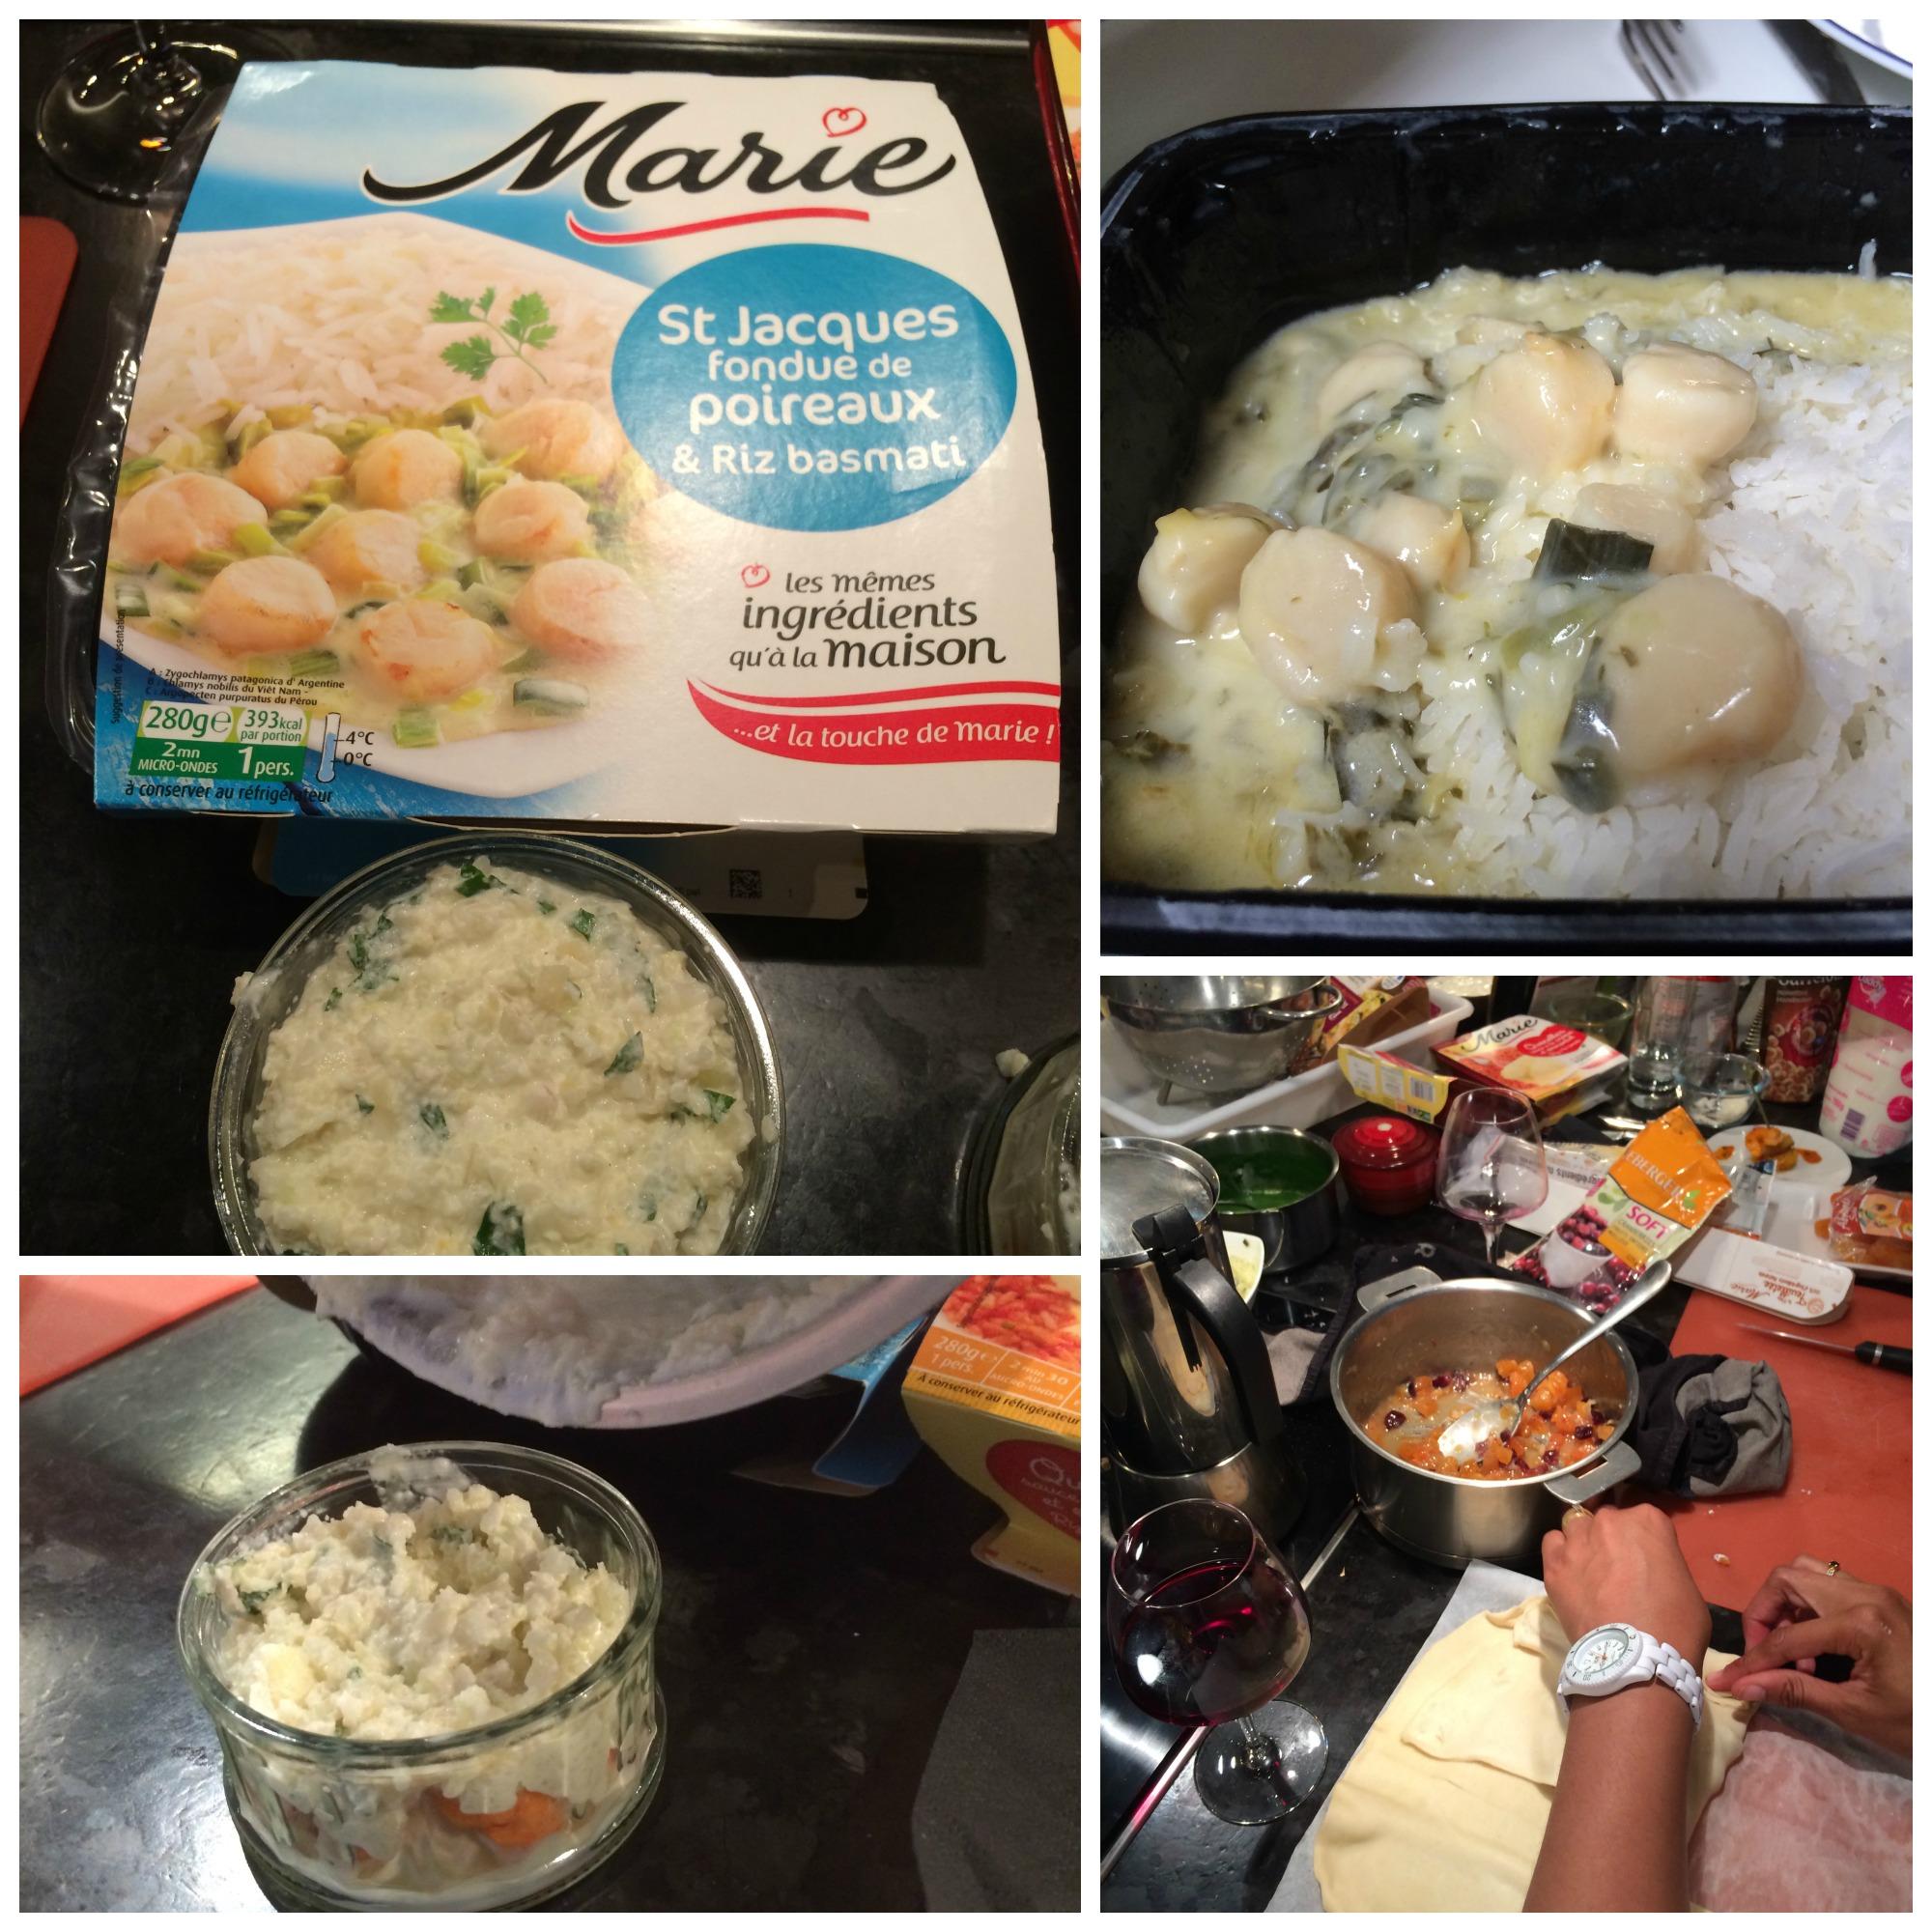 Marie Cuisiner C Est Aimer Expressions D Enfants